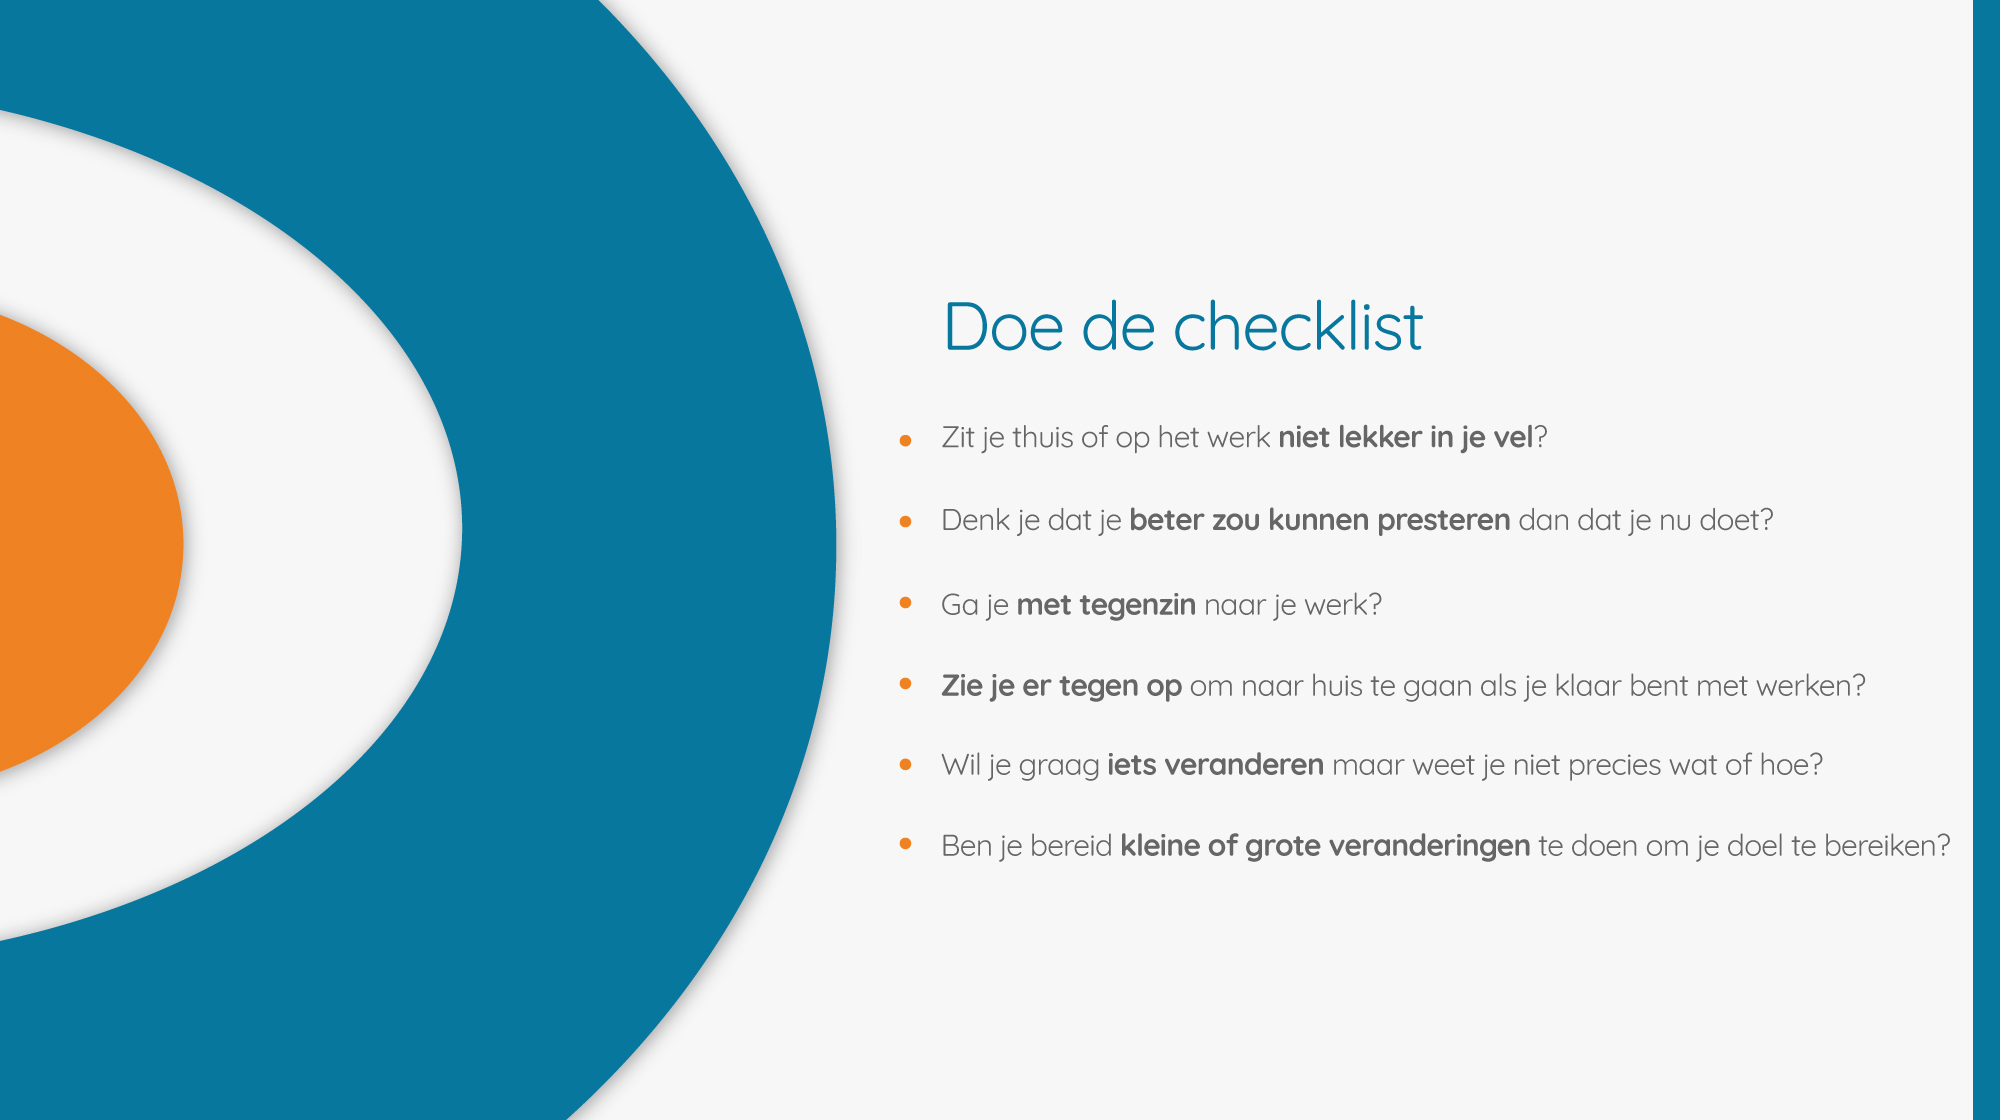 problemen met stress op je werk of privé. checklist_particulier